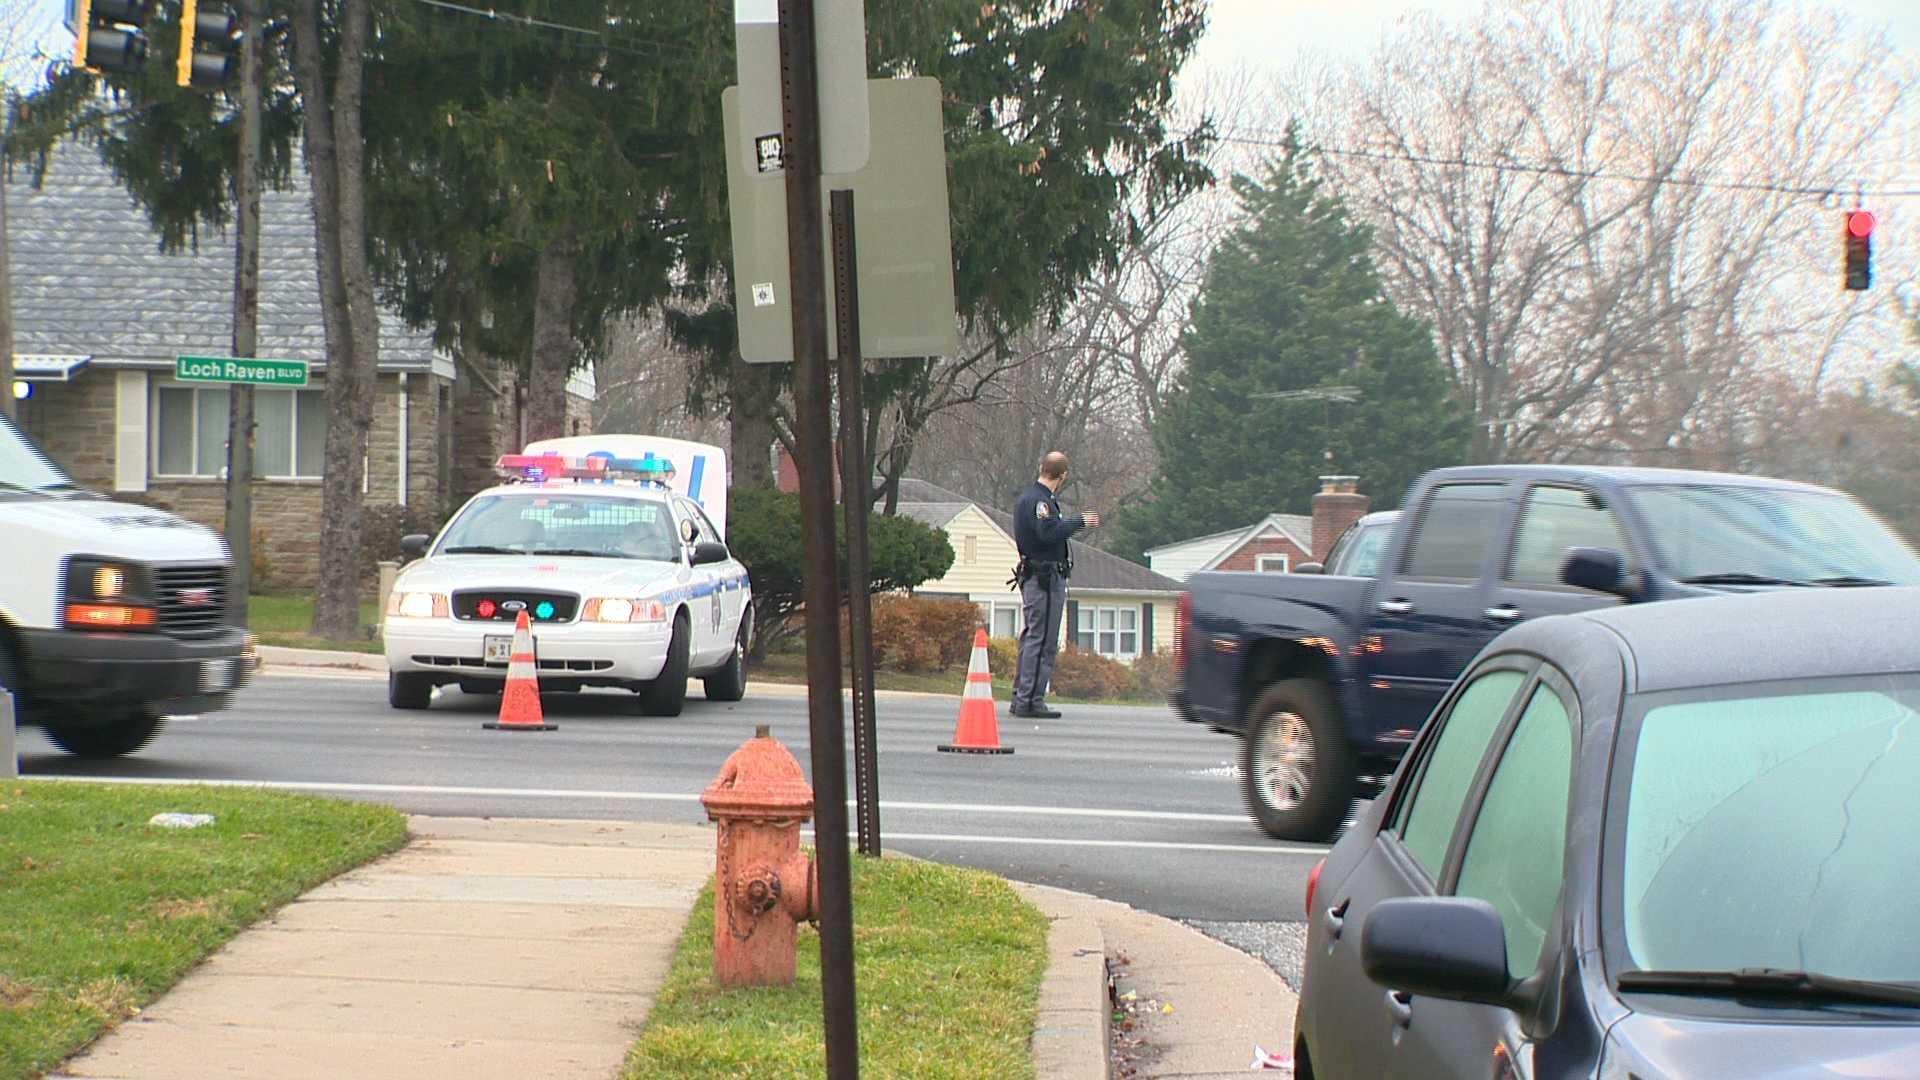 pedestrian accident scene